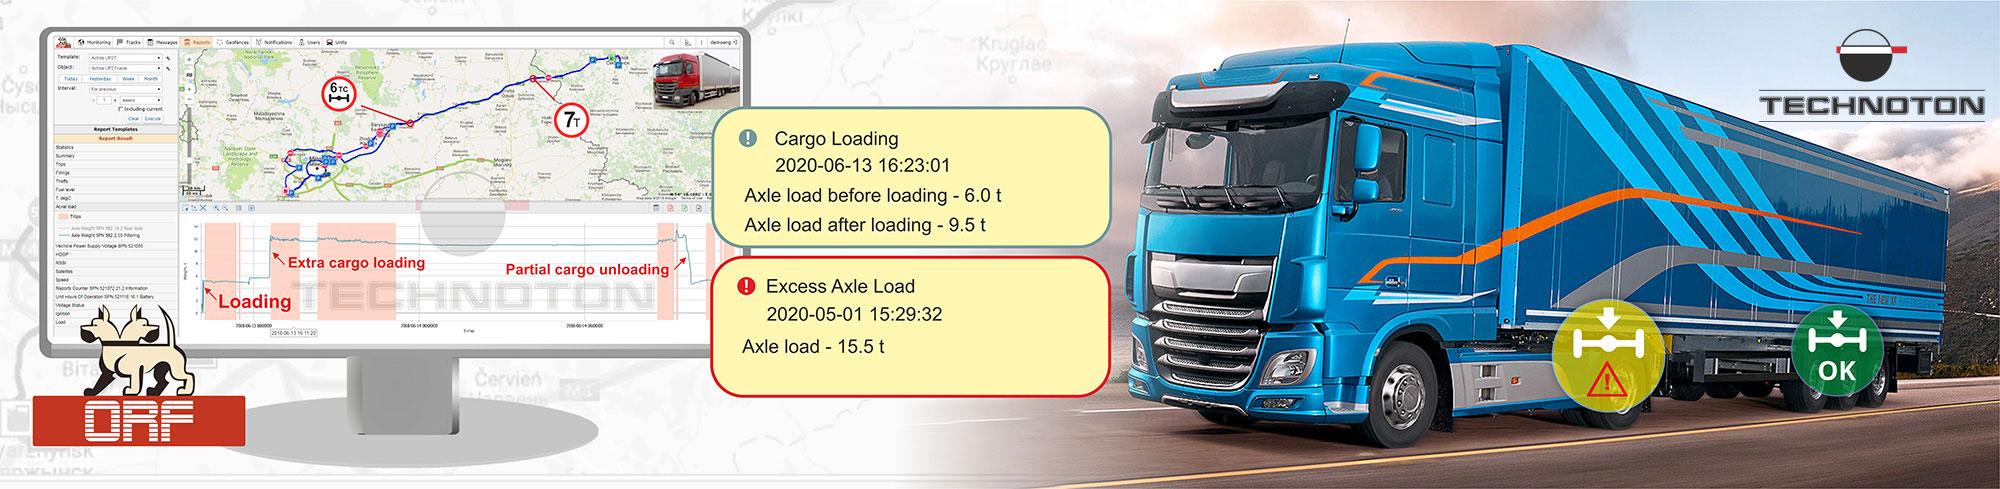 Axle load monitoring